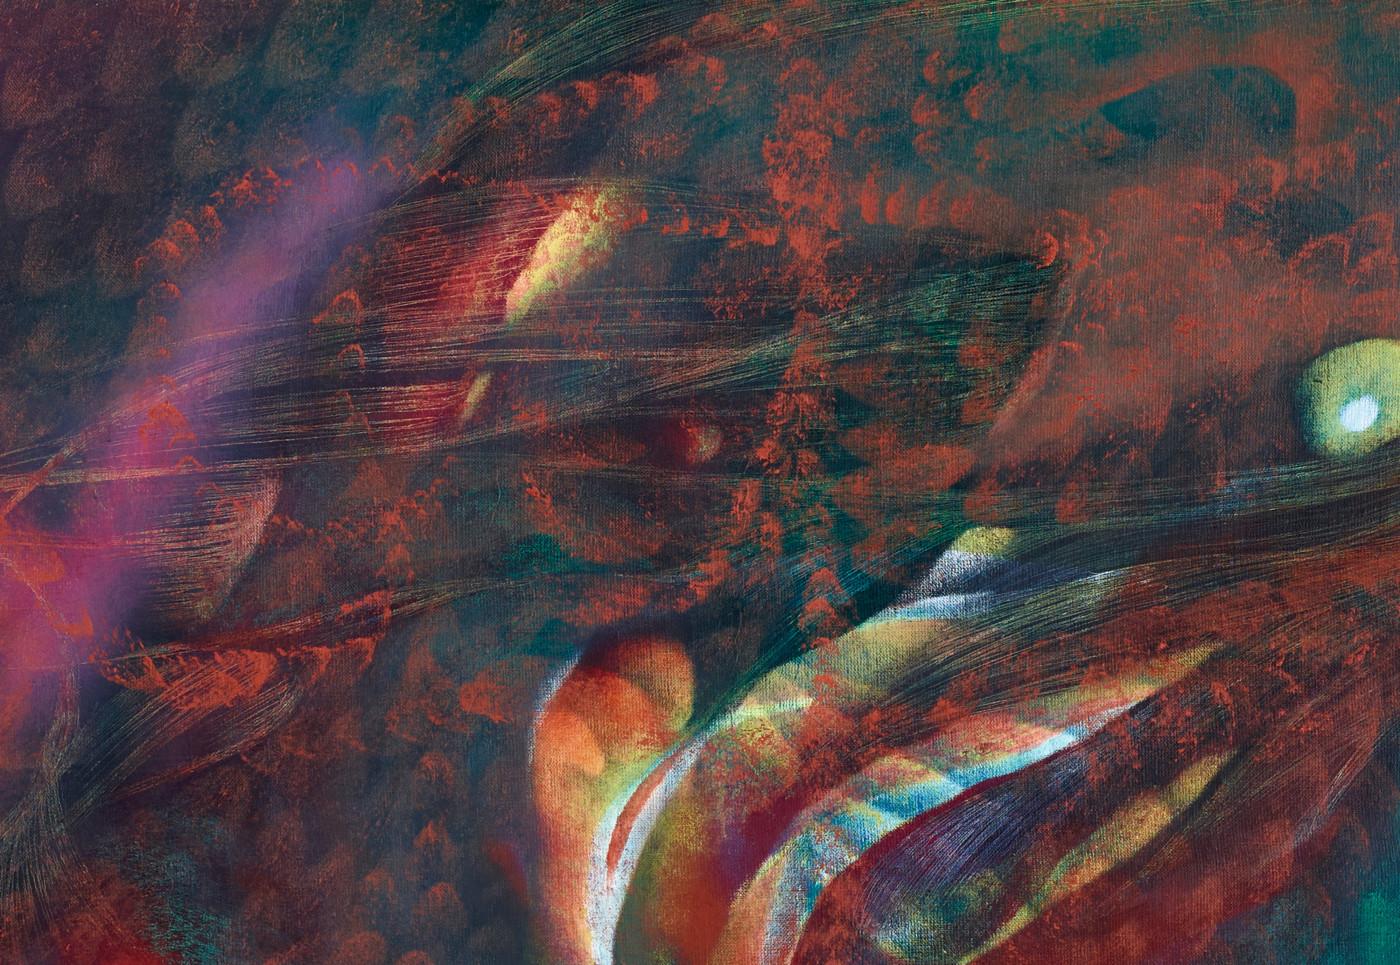 LUCY BULL  Light Rain  (detail), 2019 Oil on linen 152,5 x 127 x 4 cm / 60 x 50 x 1.5 in - High Art Gallery Paris